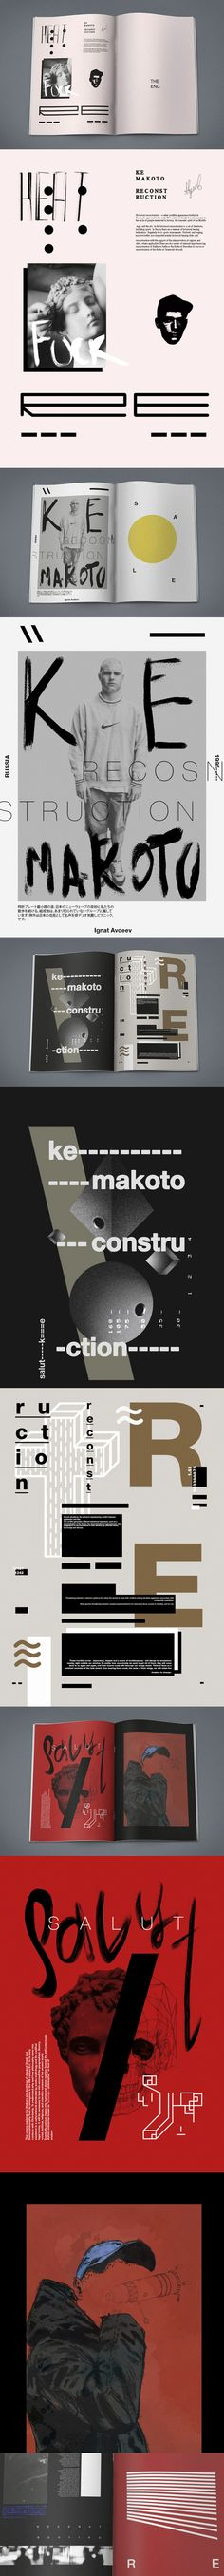 Ke Макото Reconstruction 2013 | Art direction and layout: Ignat Avdeev | Size: 420x297mm (open size)